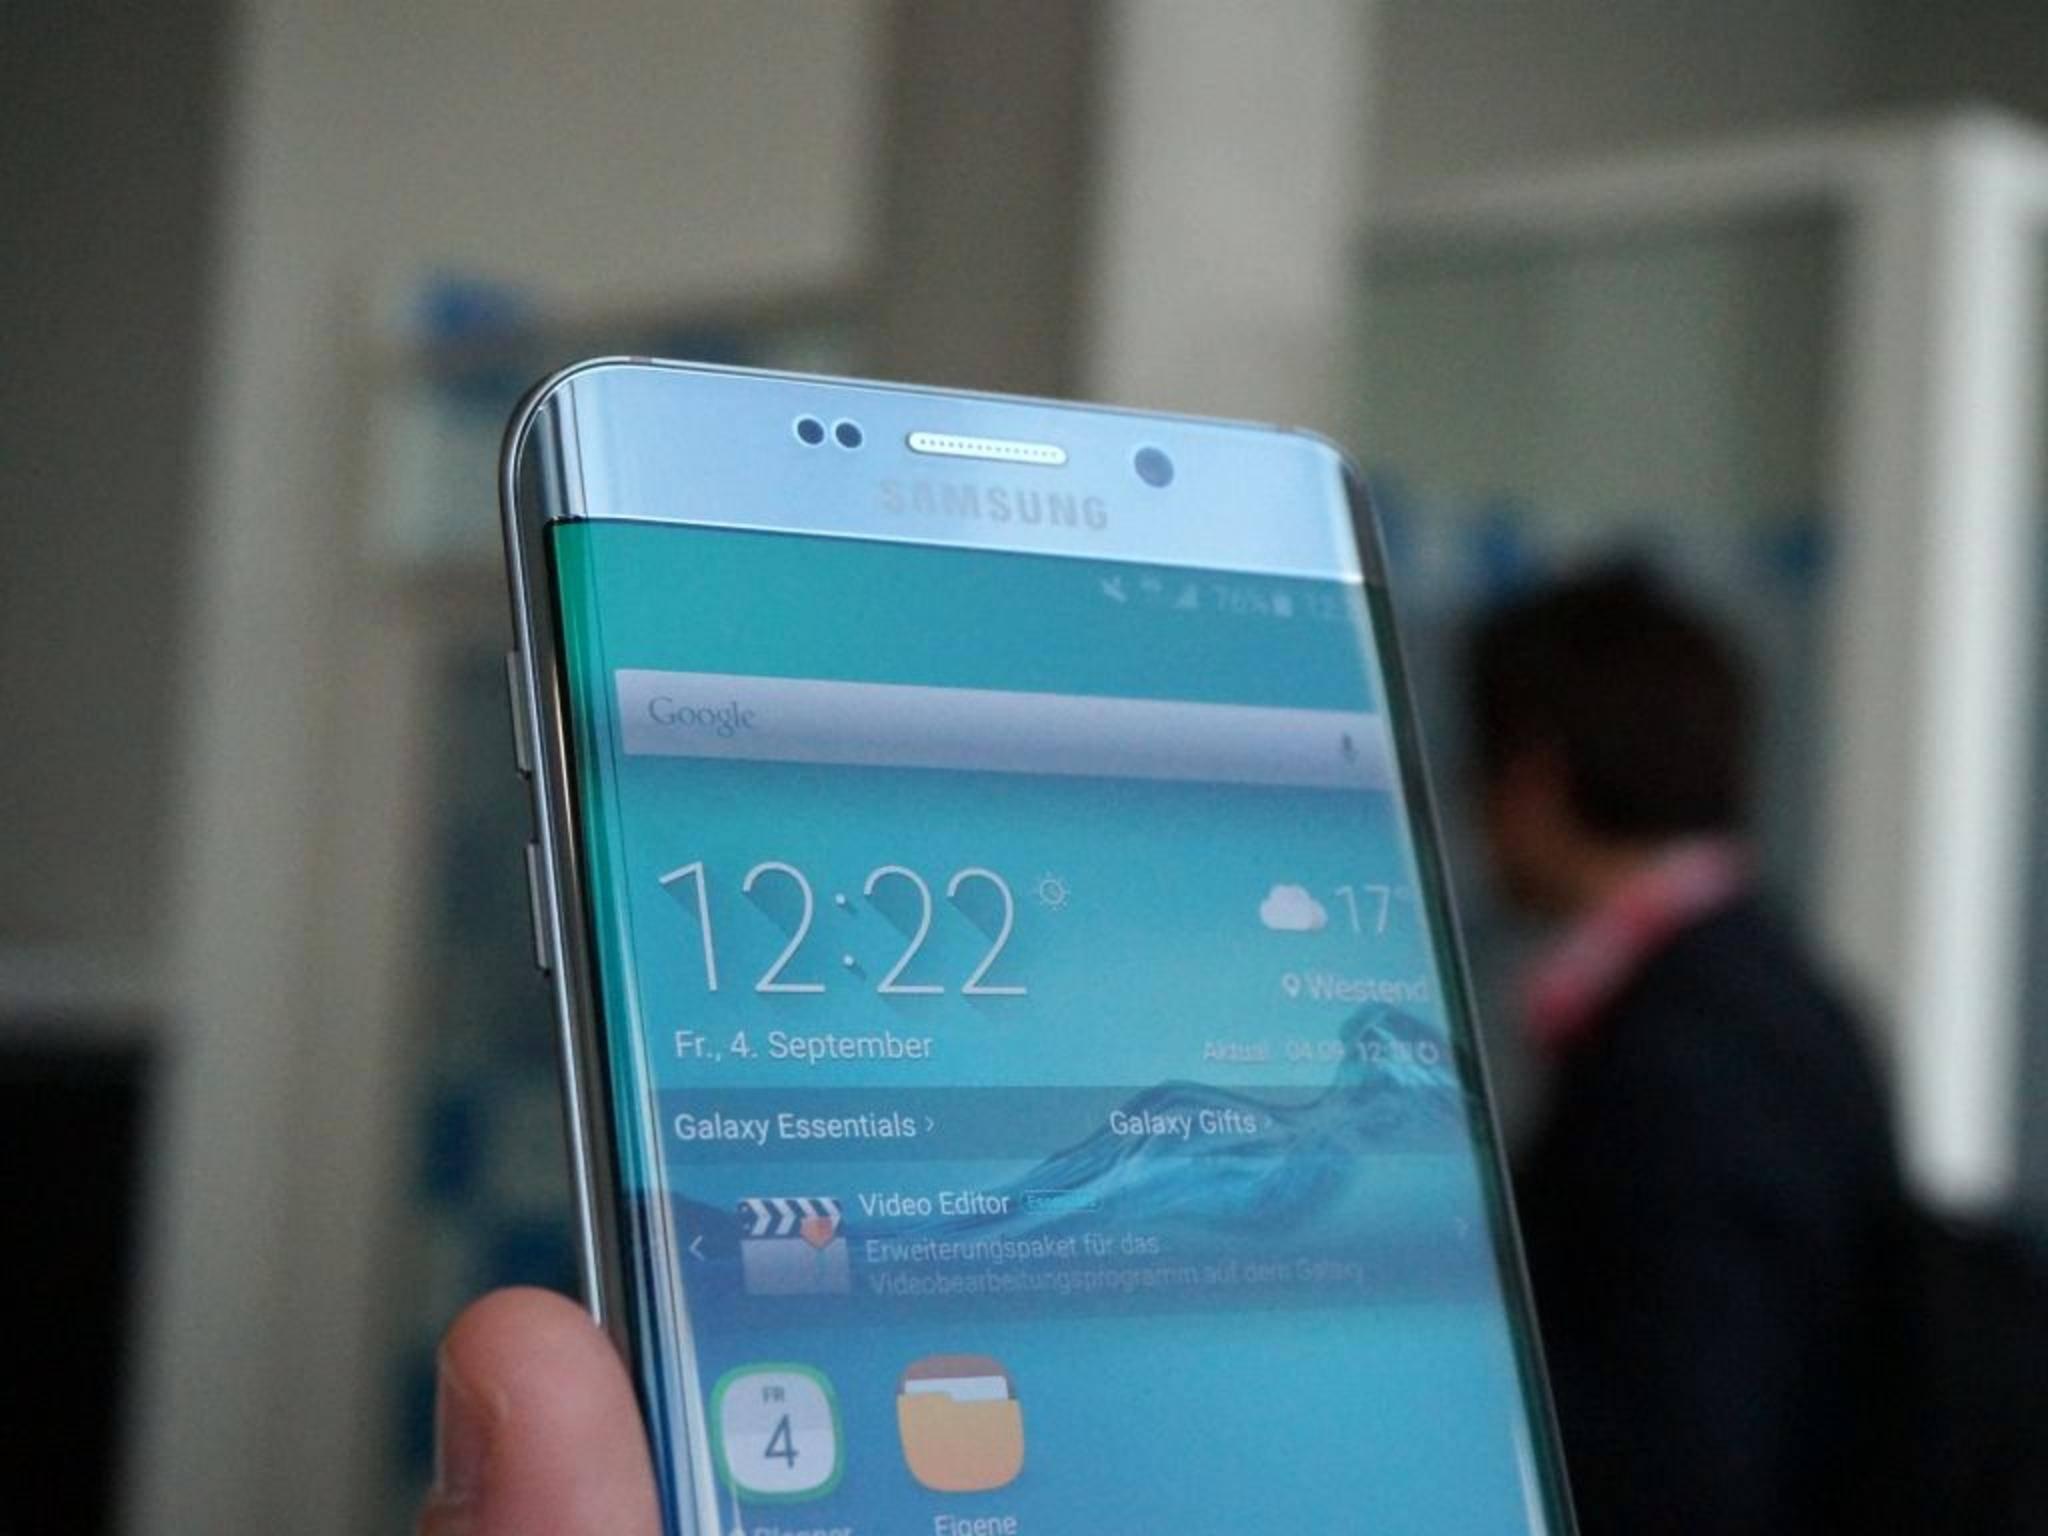 Samsung Galaxy S6 Edge+ 17